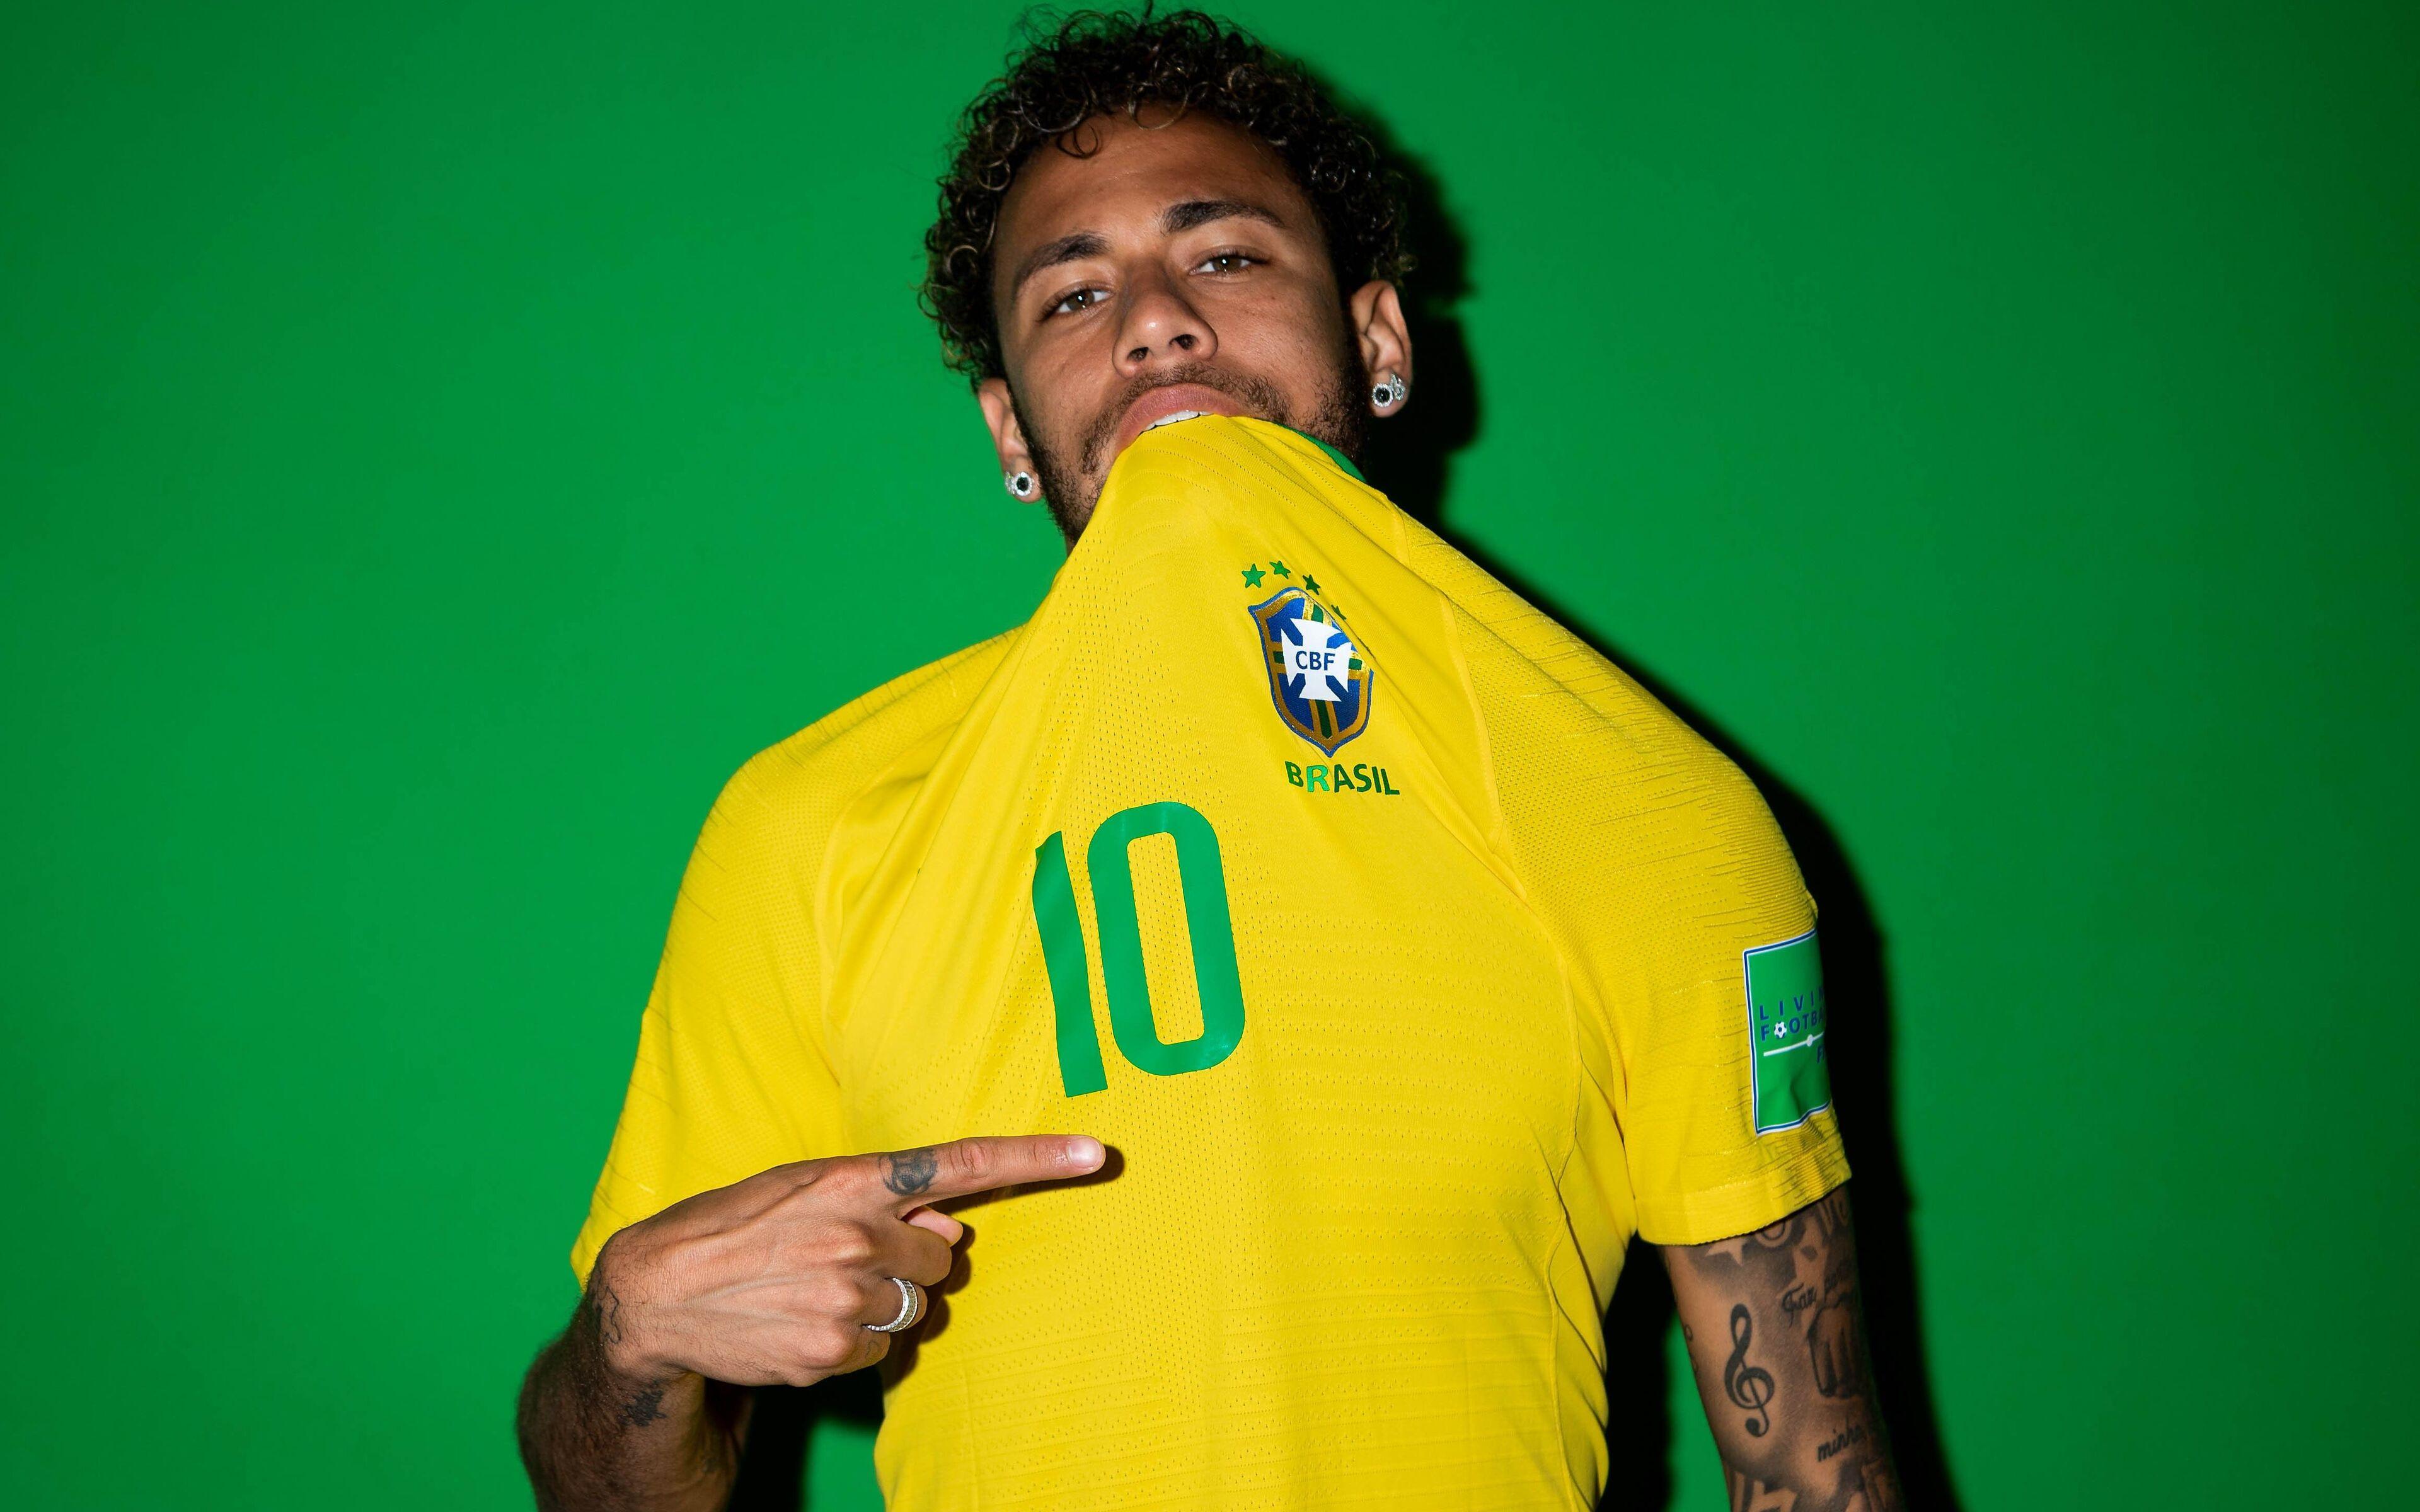 3840x2400 Neymar Jr Brazil Portraits 2018 4k Hd 4k Wallpapers